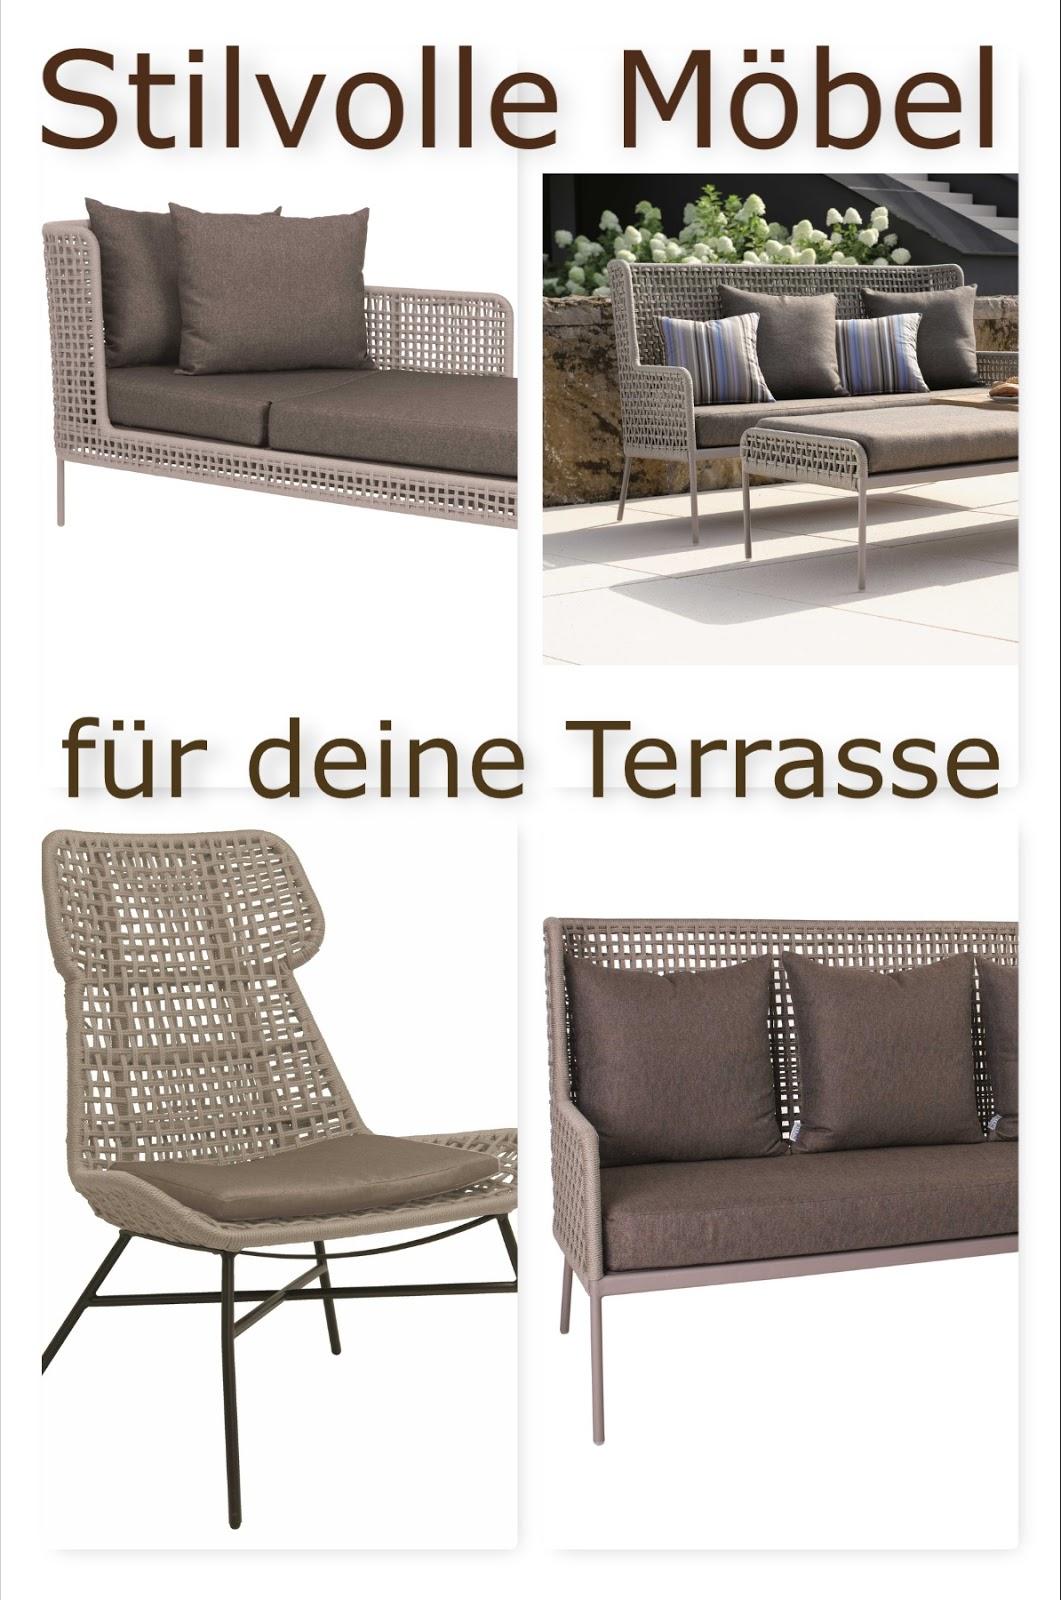 Holzland Gartensofa Gartenmoebel Garten Holz Gestaltung Terrasse Lounge Loungemöbel Sitzgarnitur